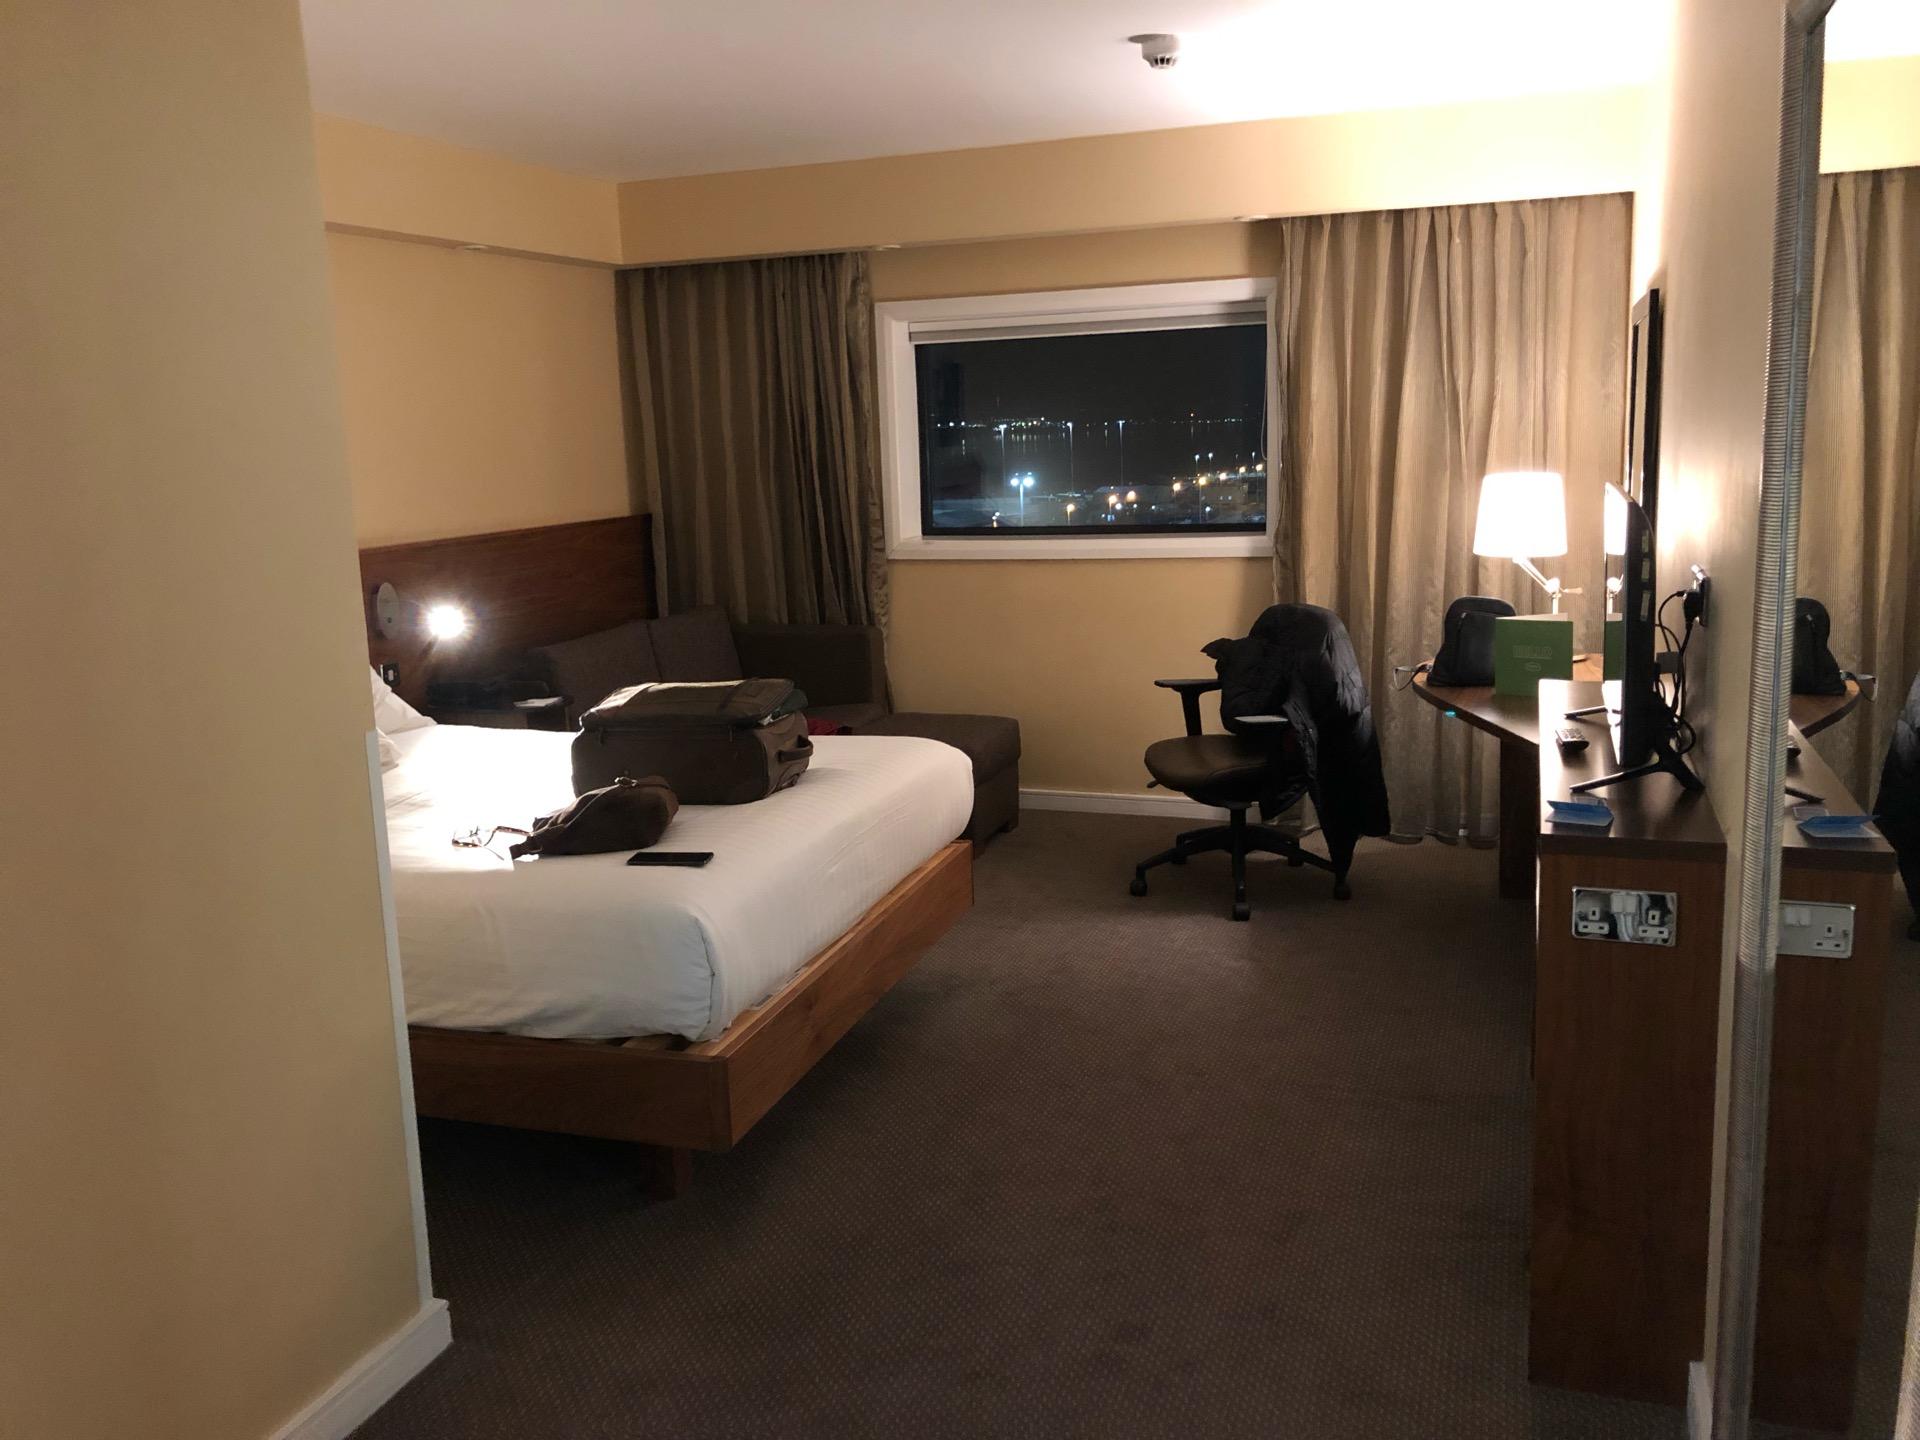 Hampton by Hilton Liverpool John Lennon Airport Hotel | Speke Hall Ave, Liverpool L24 1YD | +44 845 122 6787